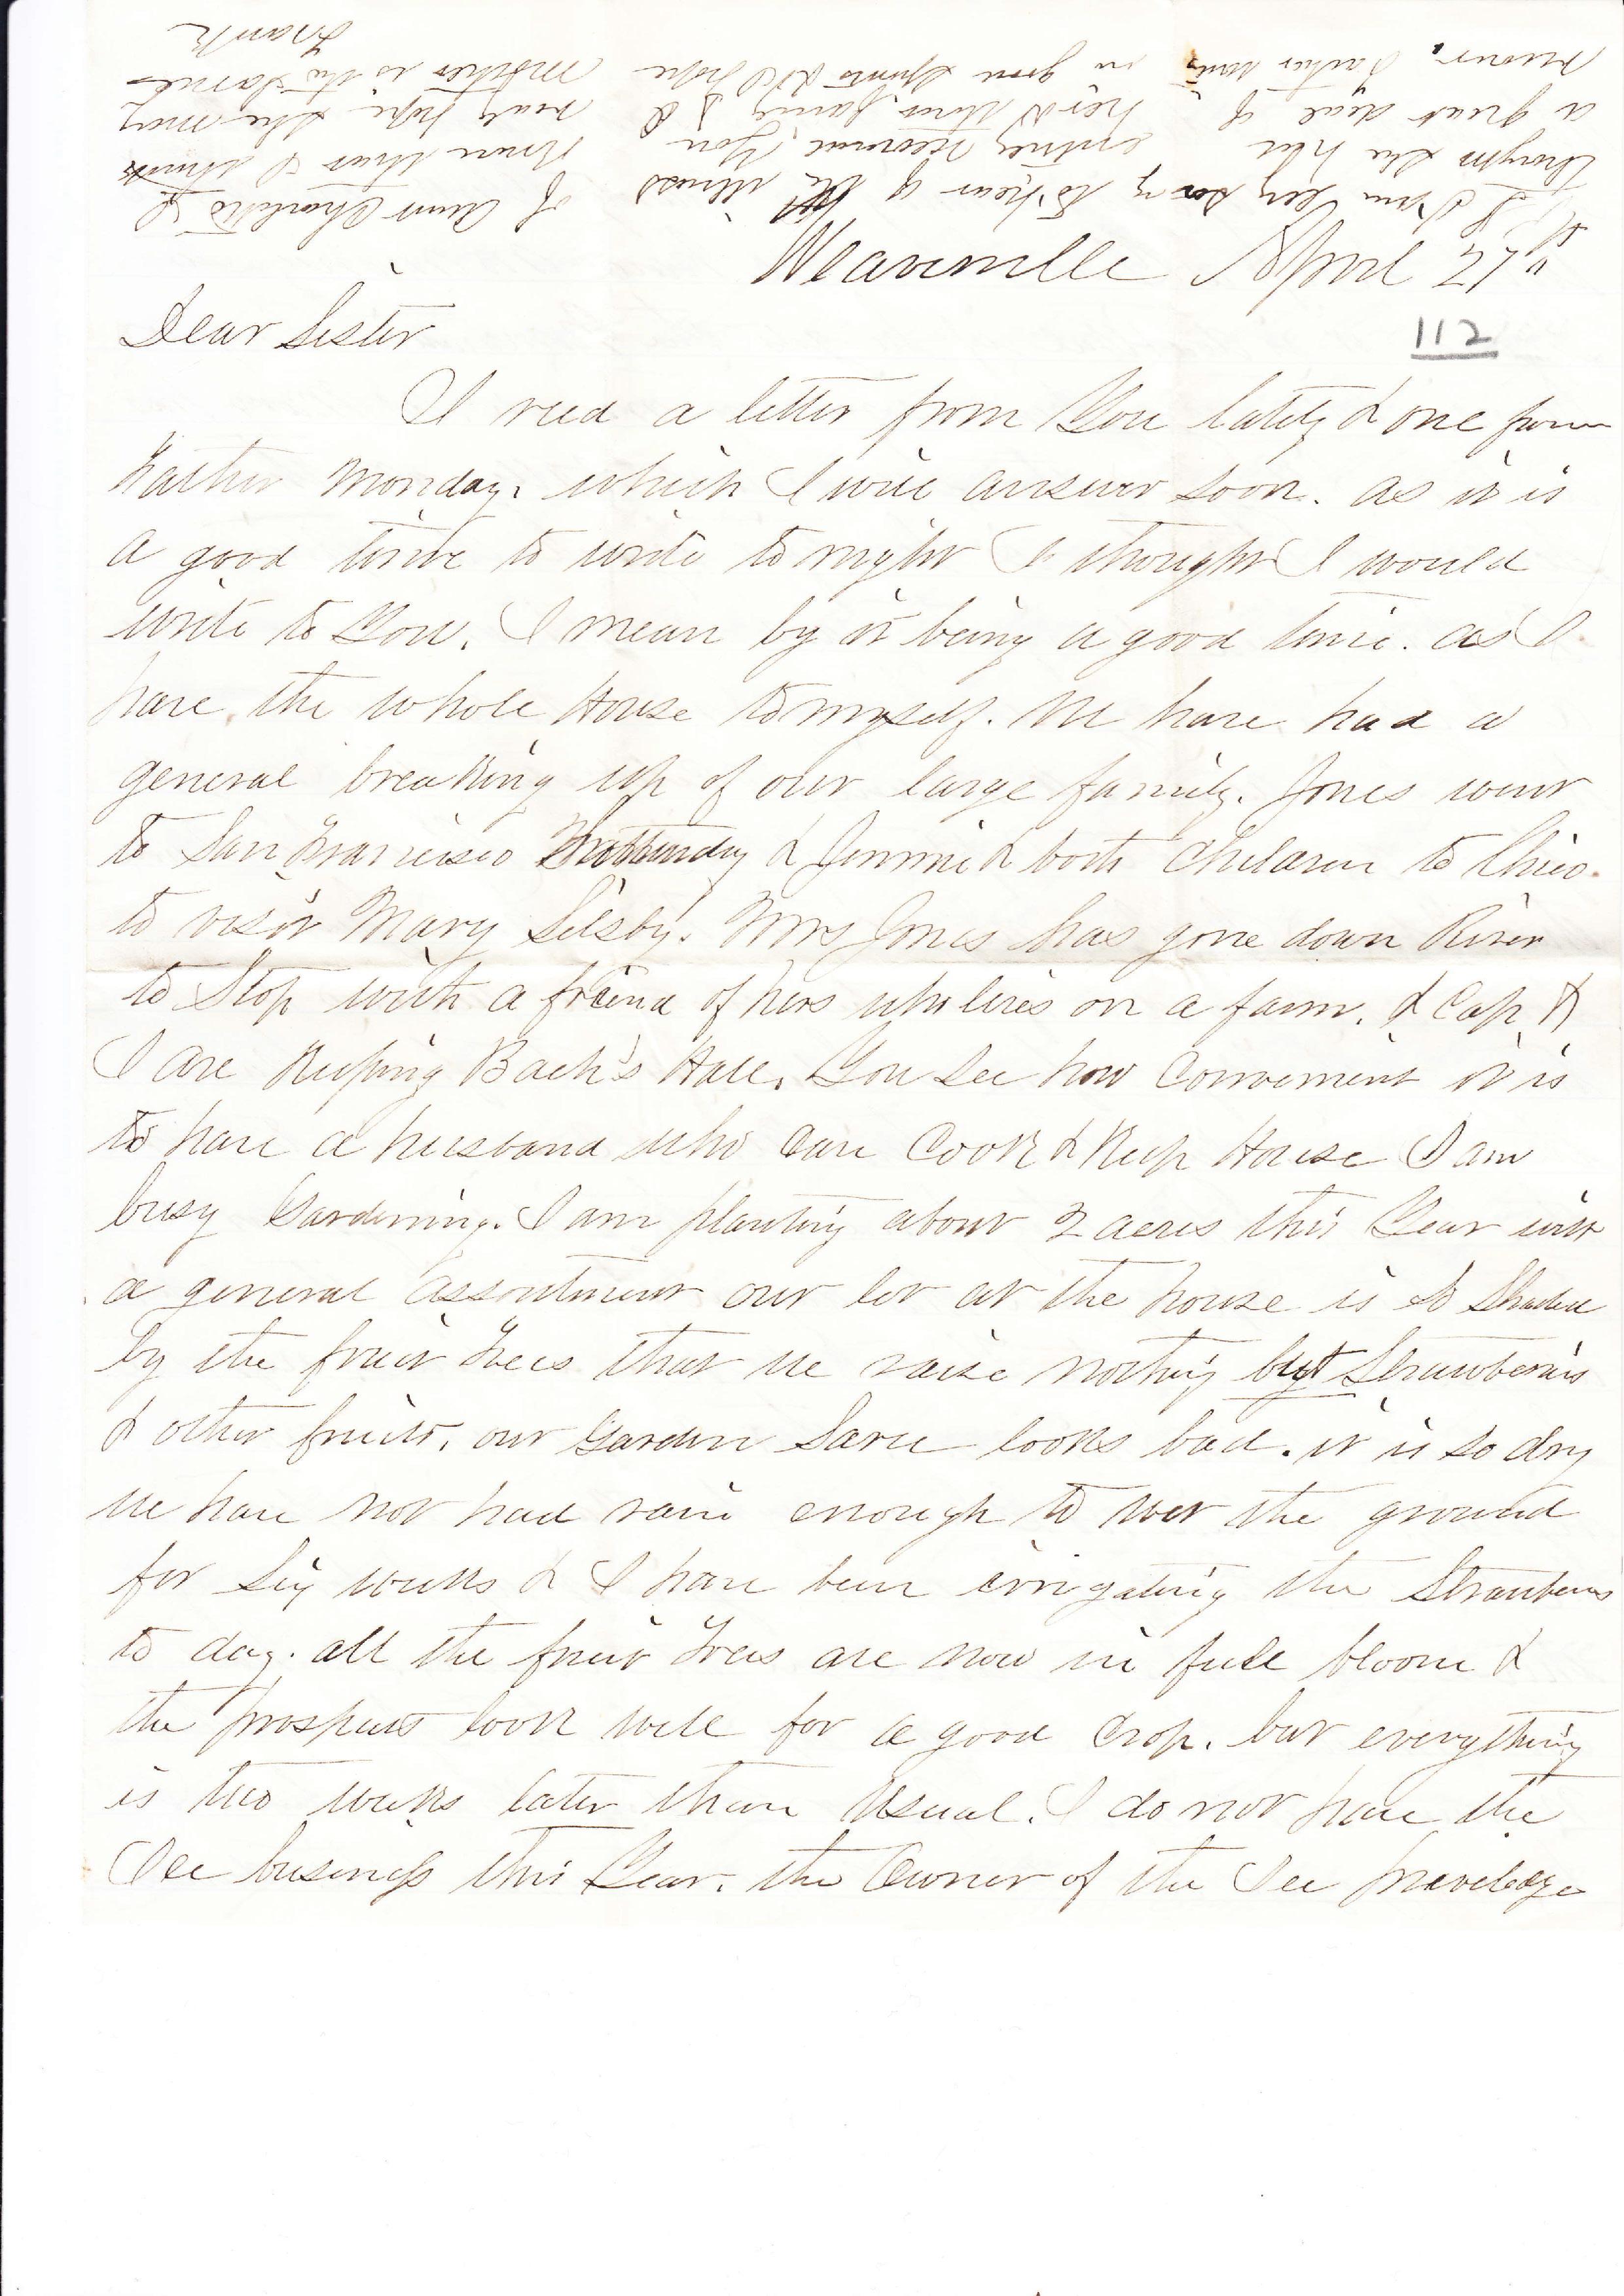 Franklin Augustus Buck to Mary Sewall Bradley